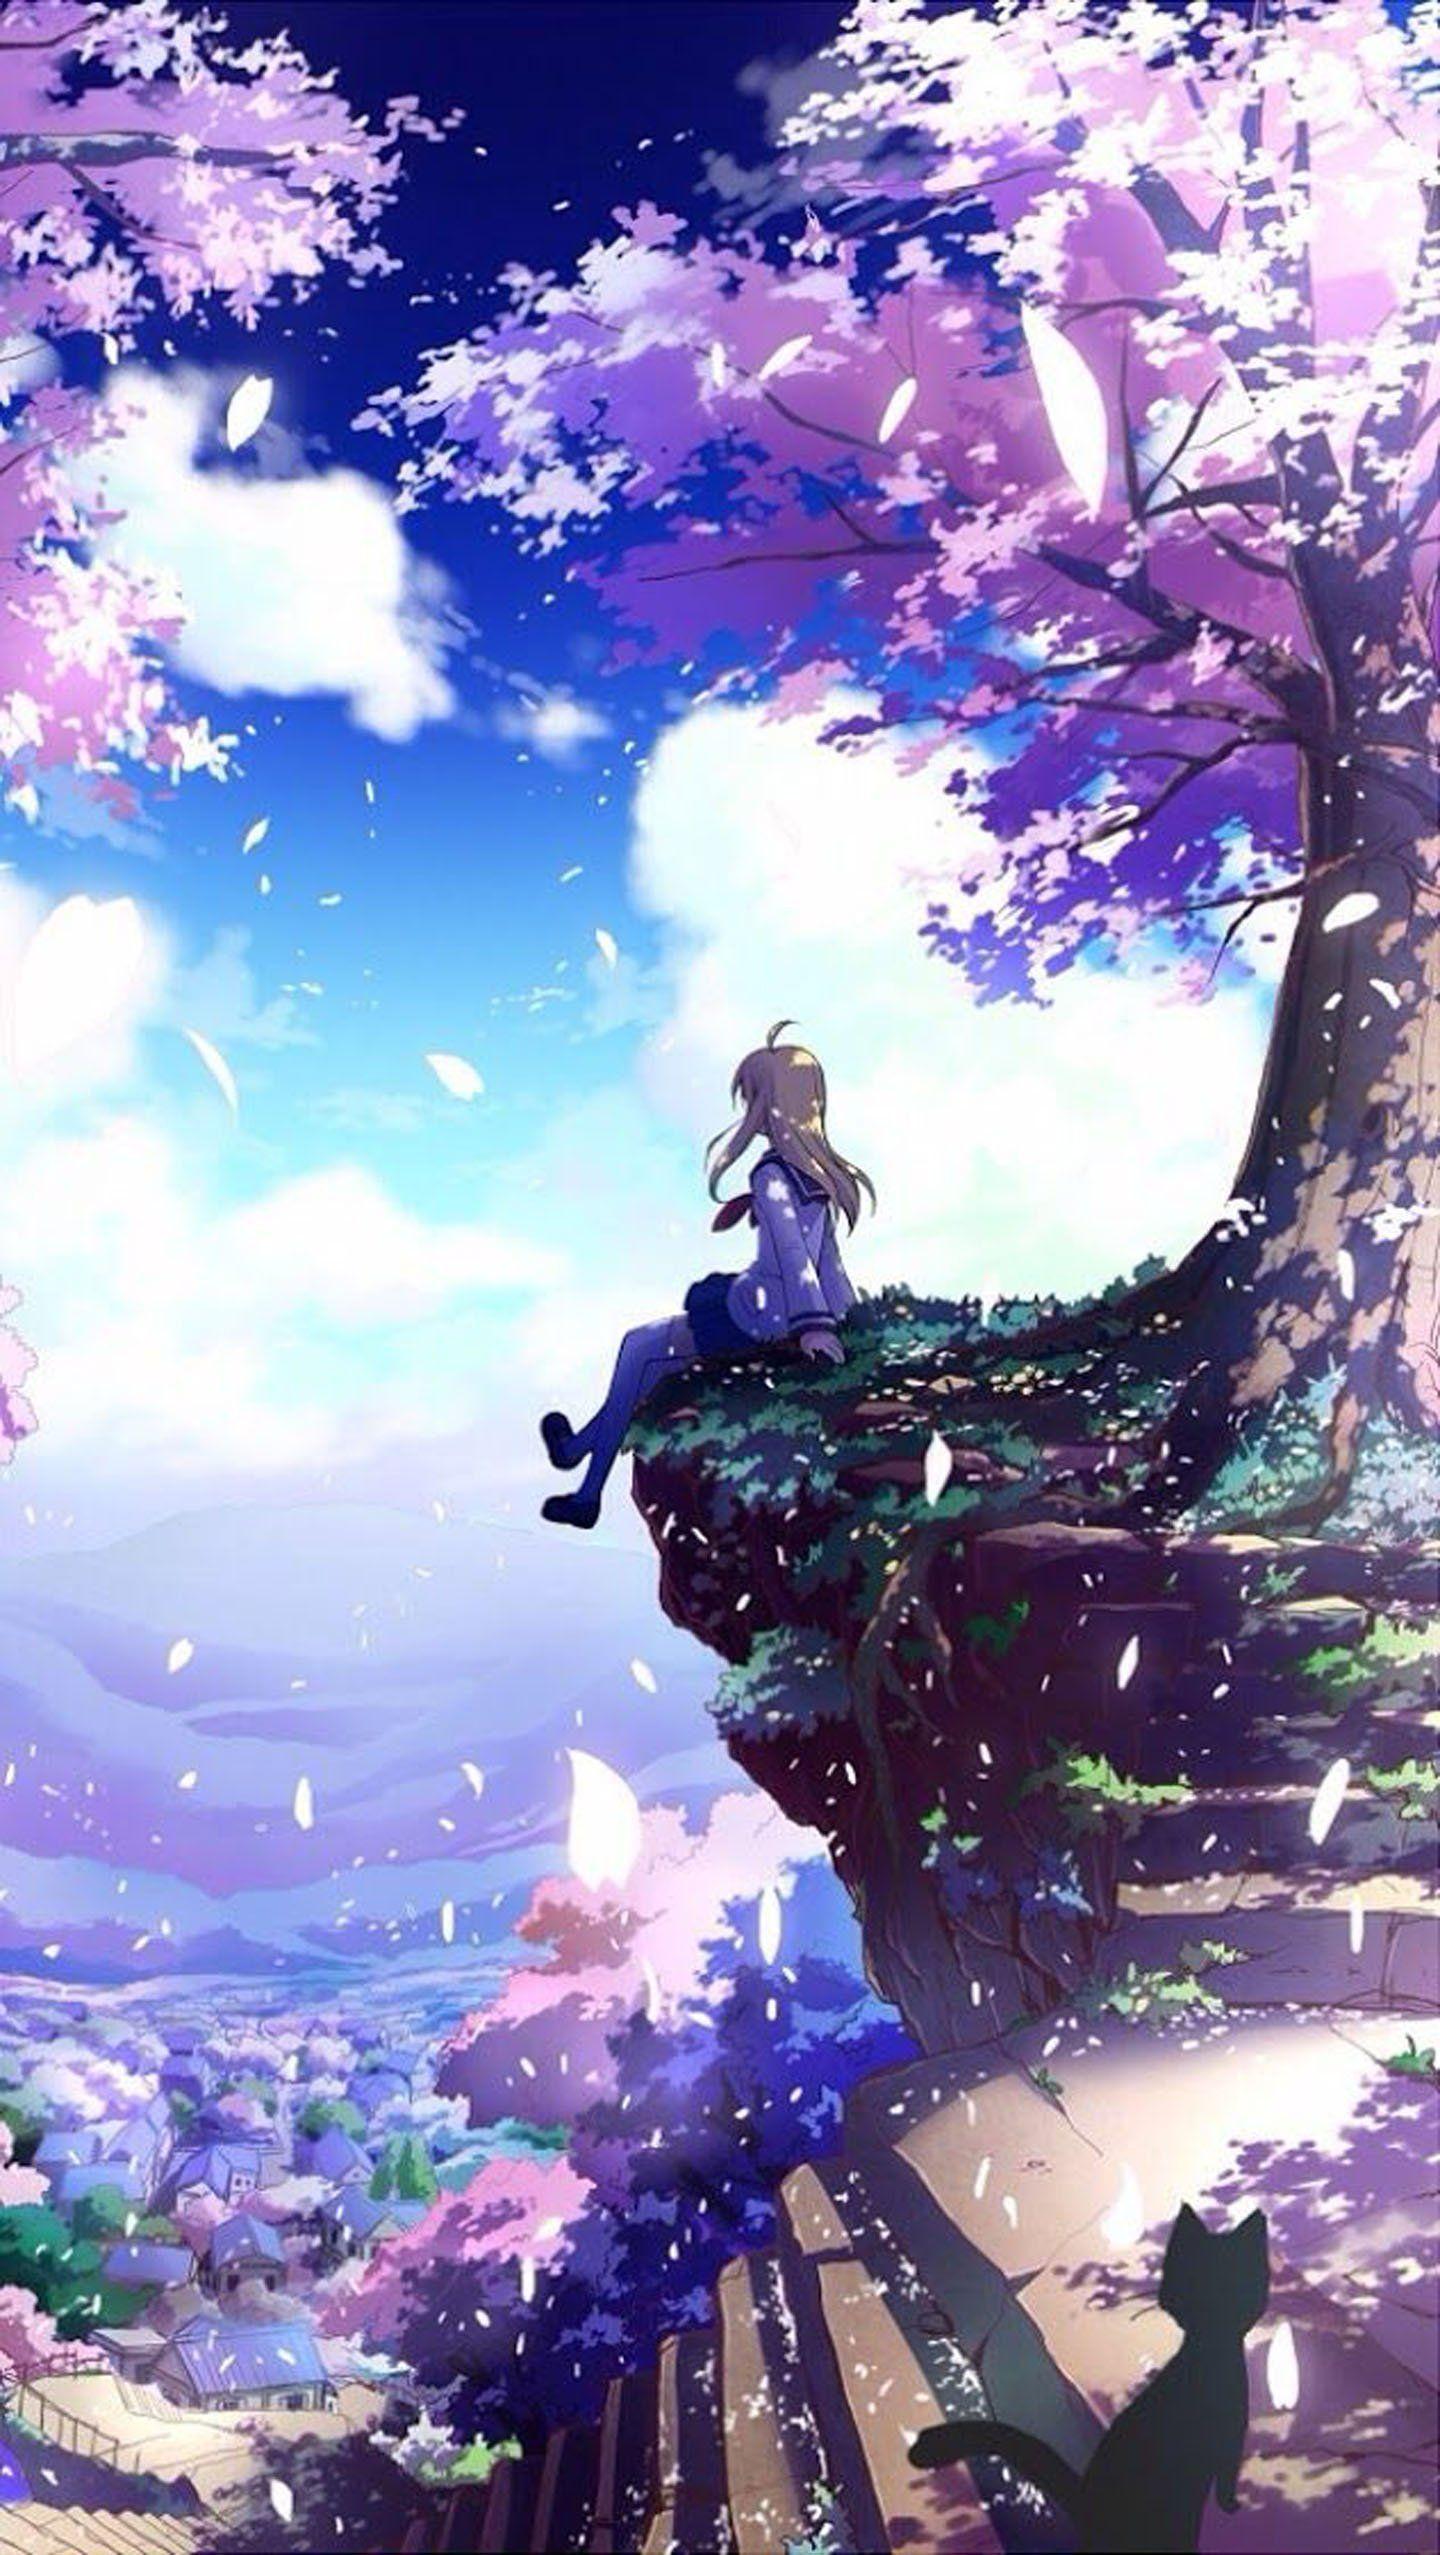 Anime Girl Summer : anime, summer, Summer, Anime, Girls, Wallpapers, Wallpaper